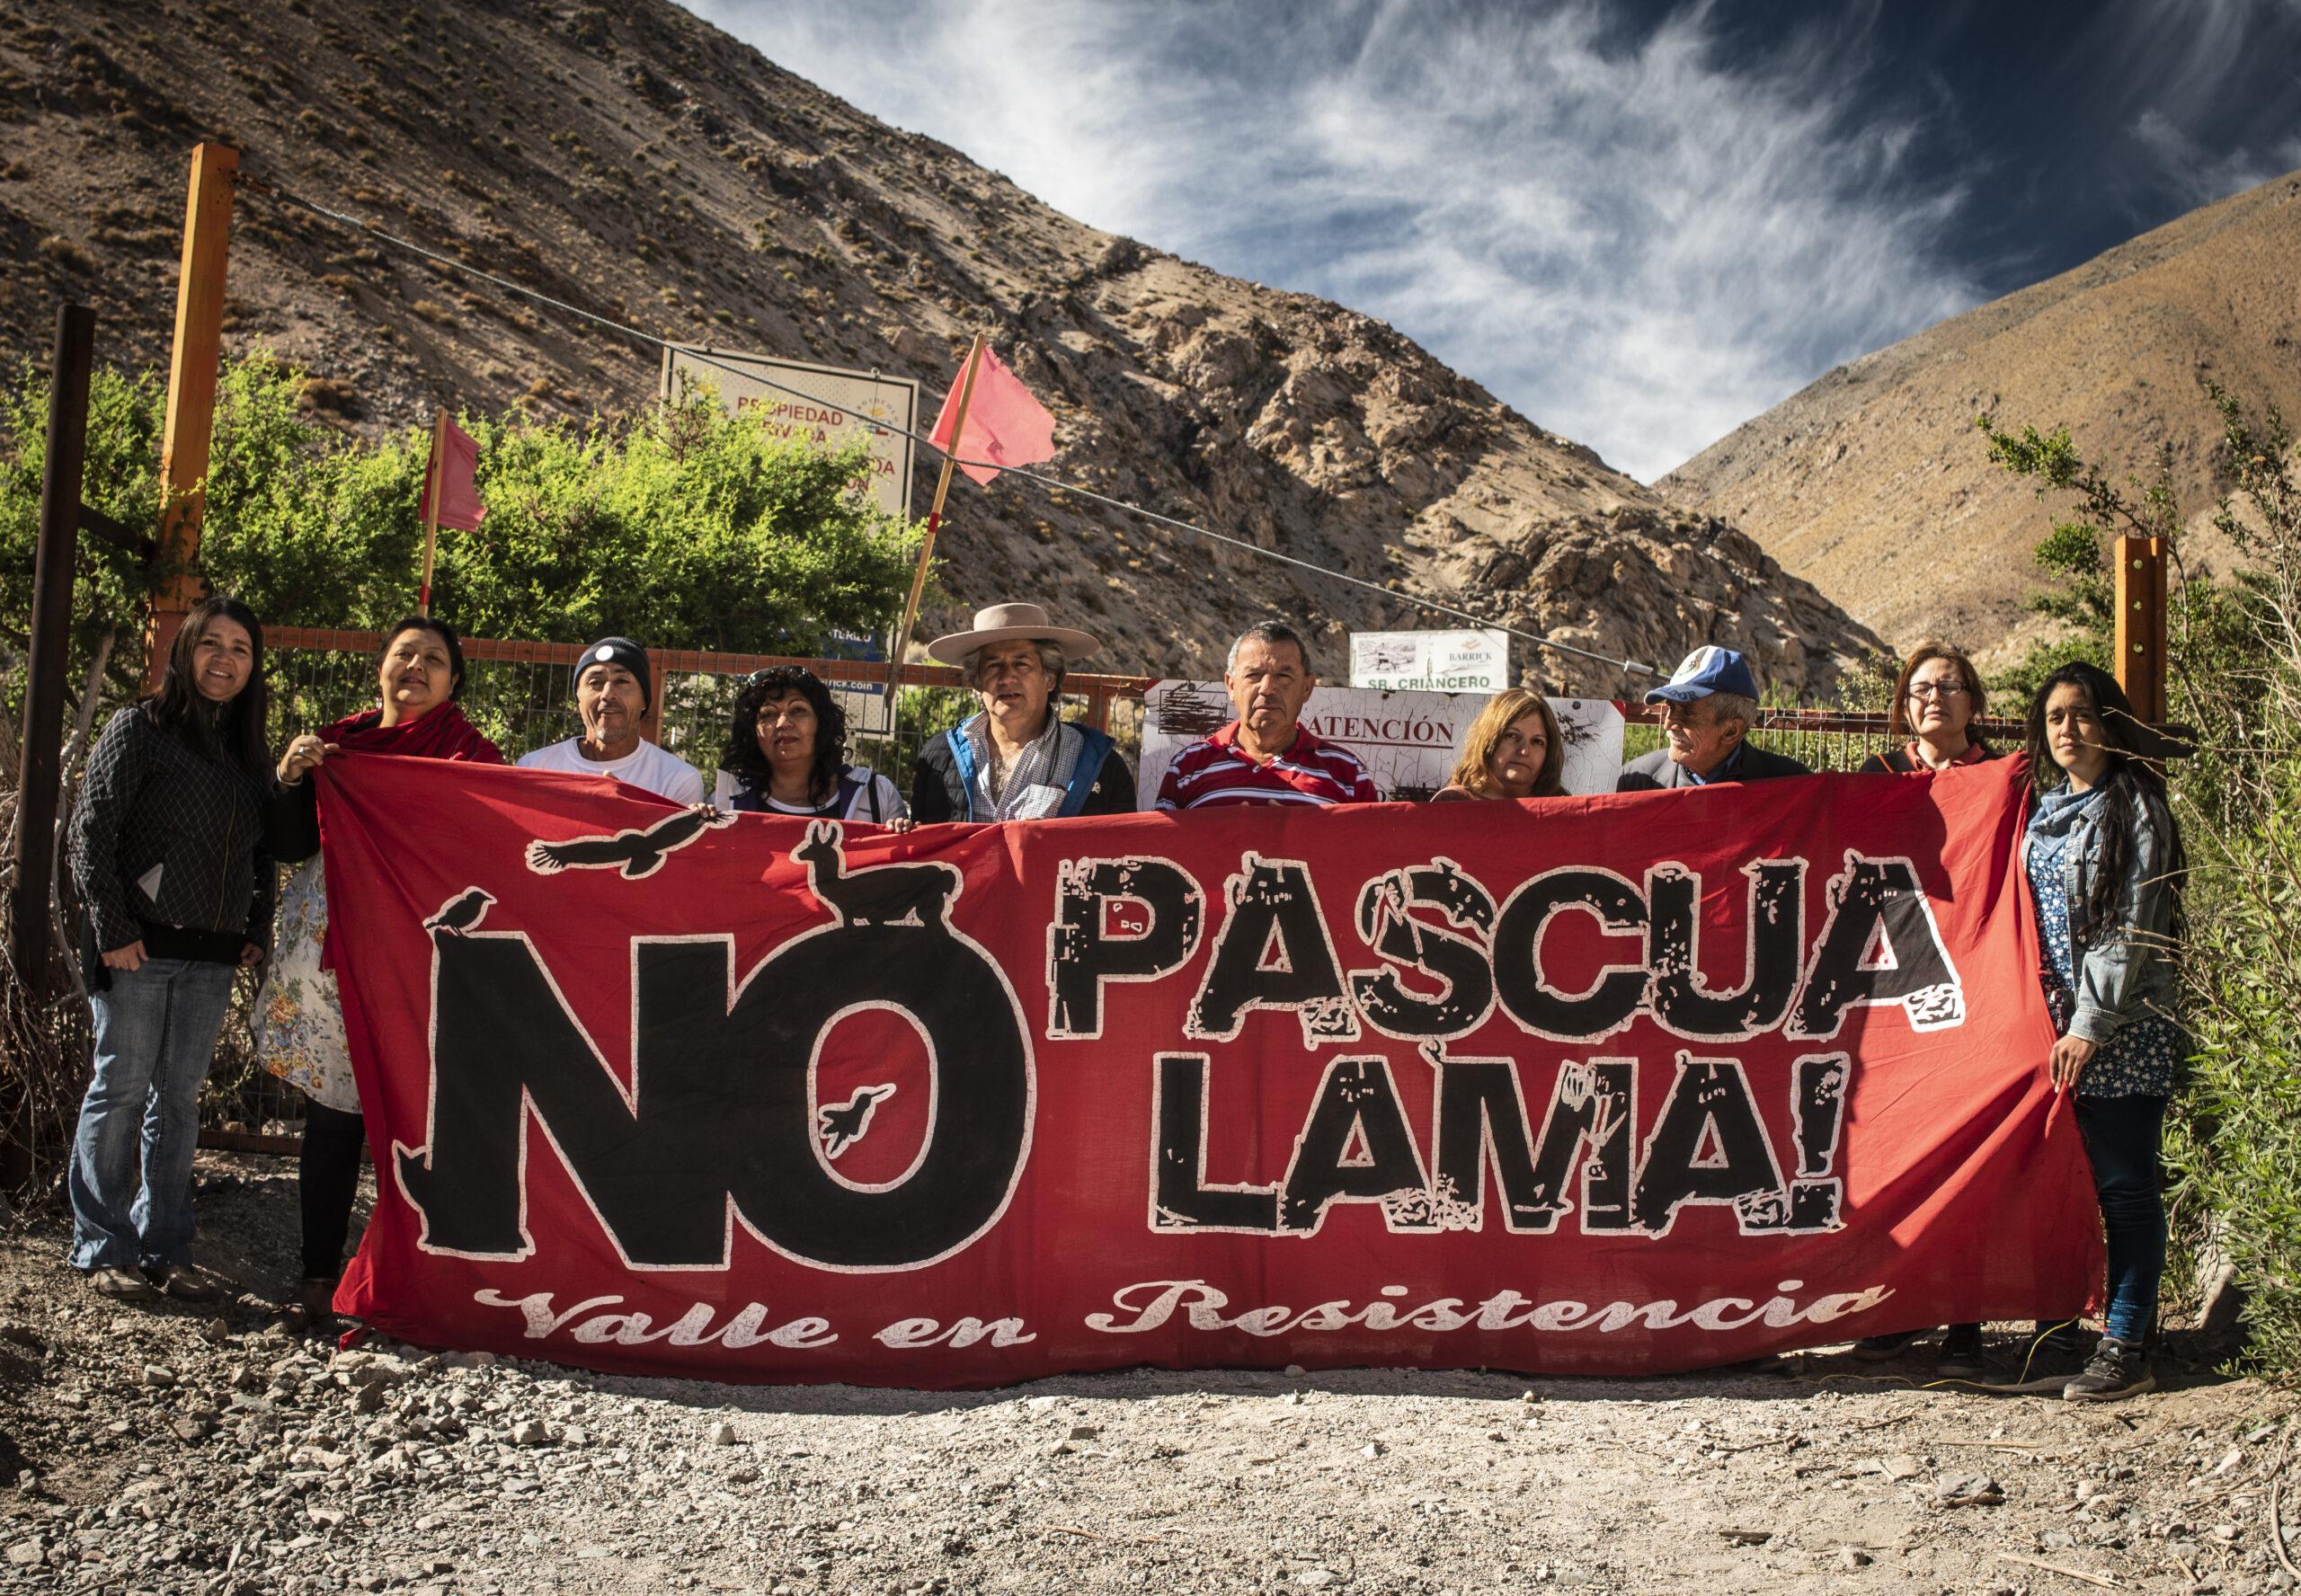 Preocupación de grupos ambientales ante pronto fallo sobre Pascua Lama